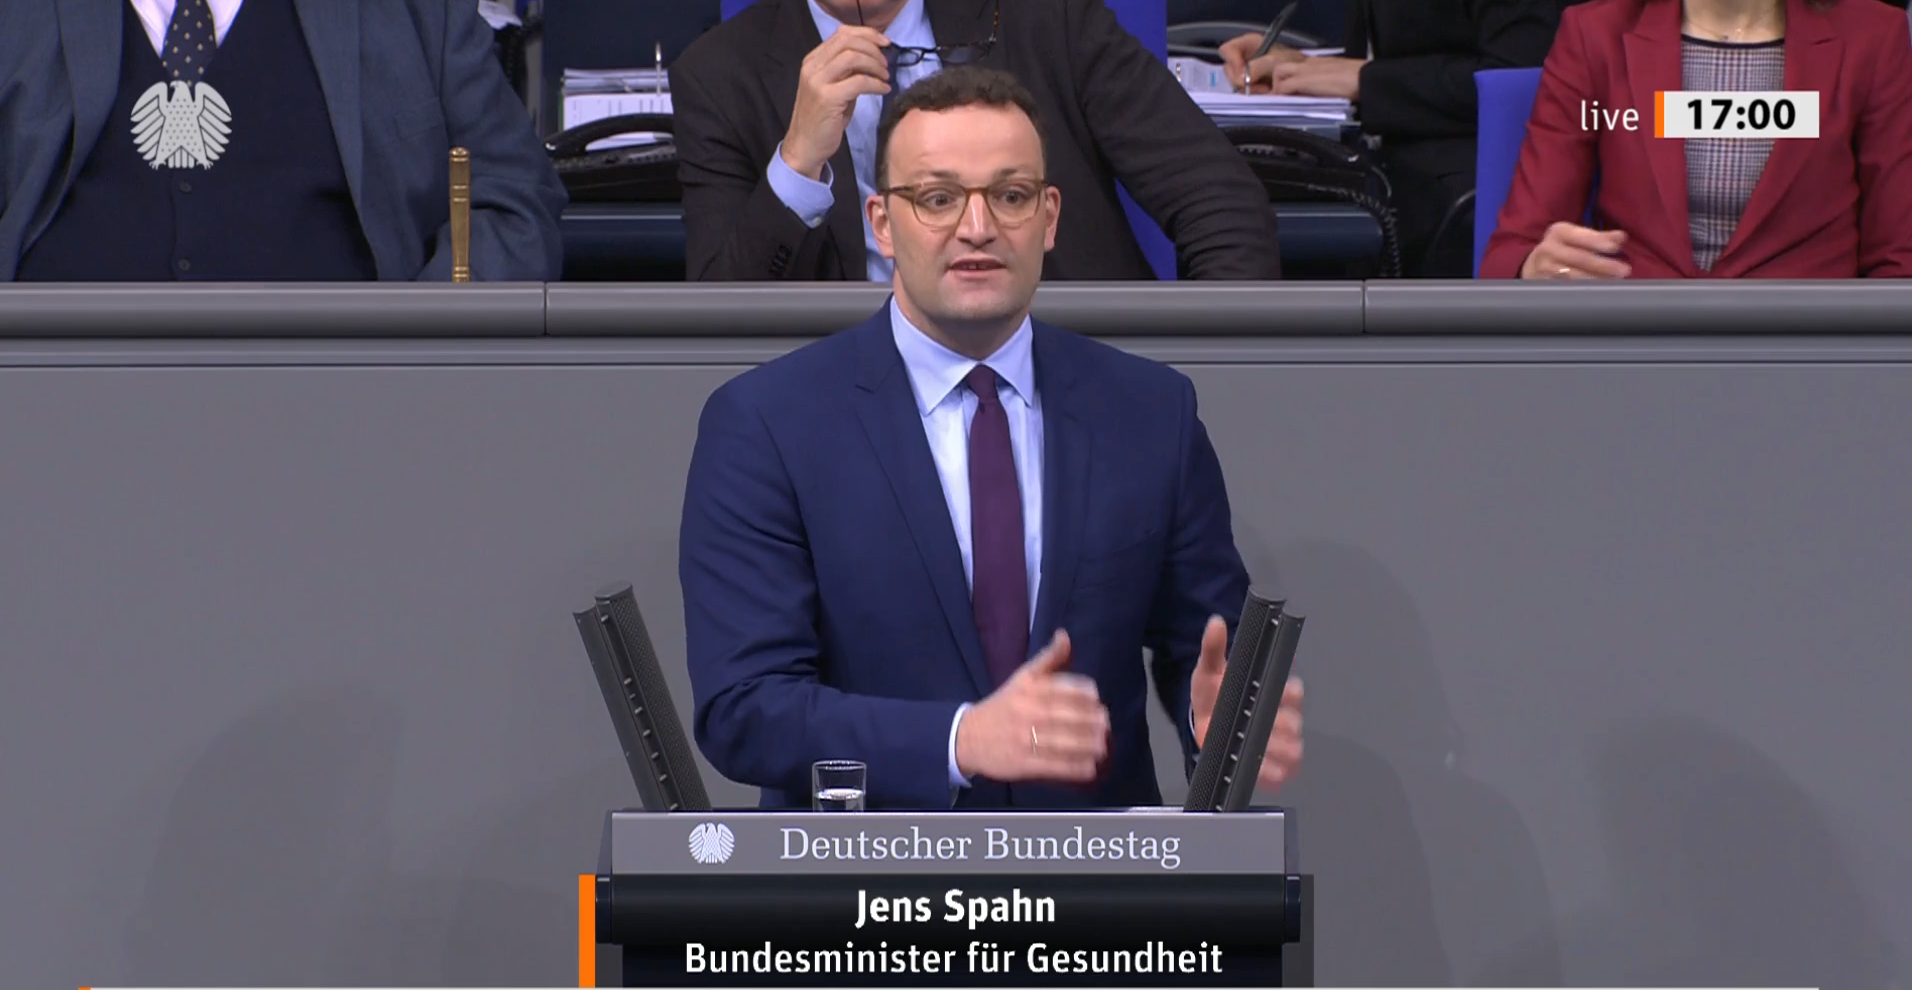 Jens Spahn am Rednerpult des Bundestages